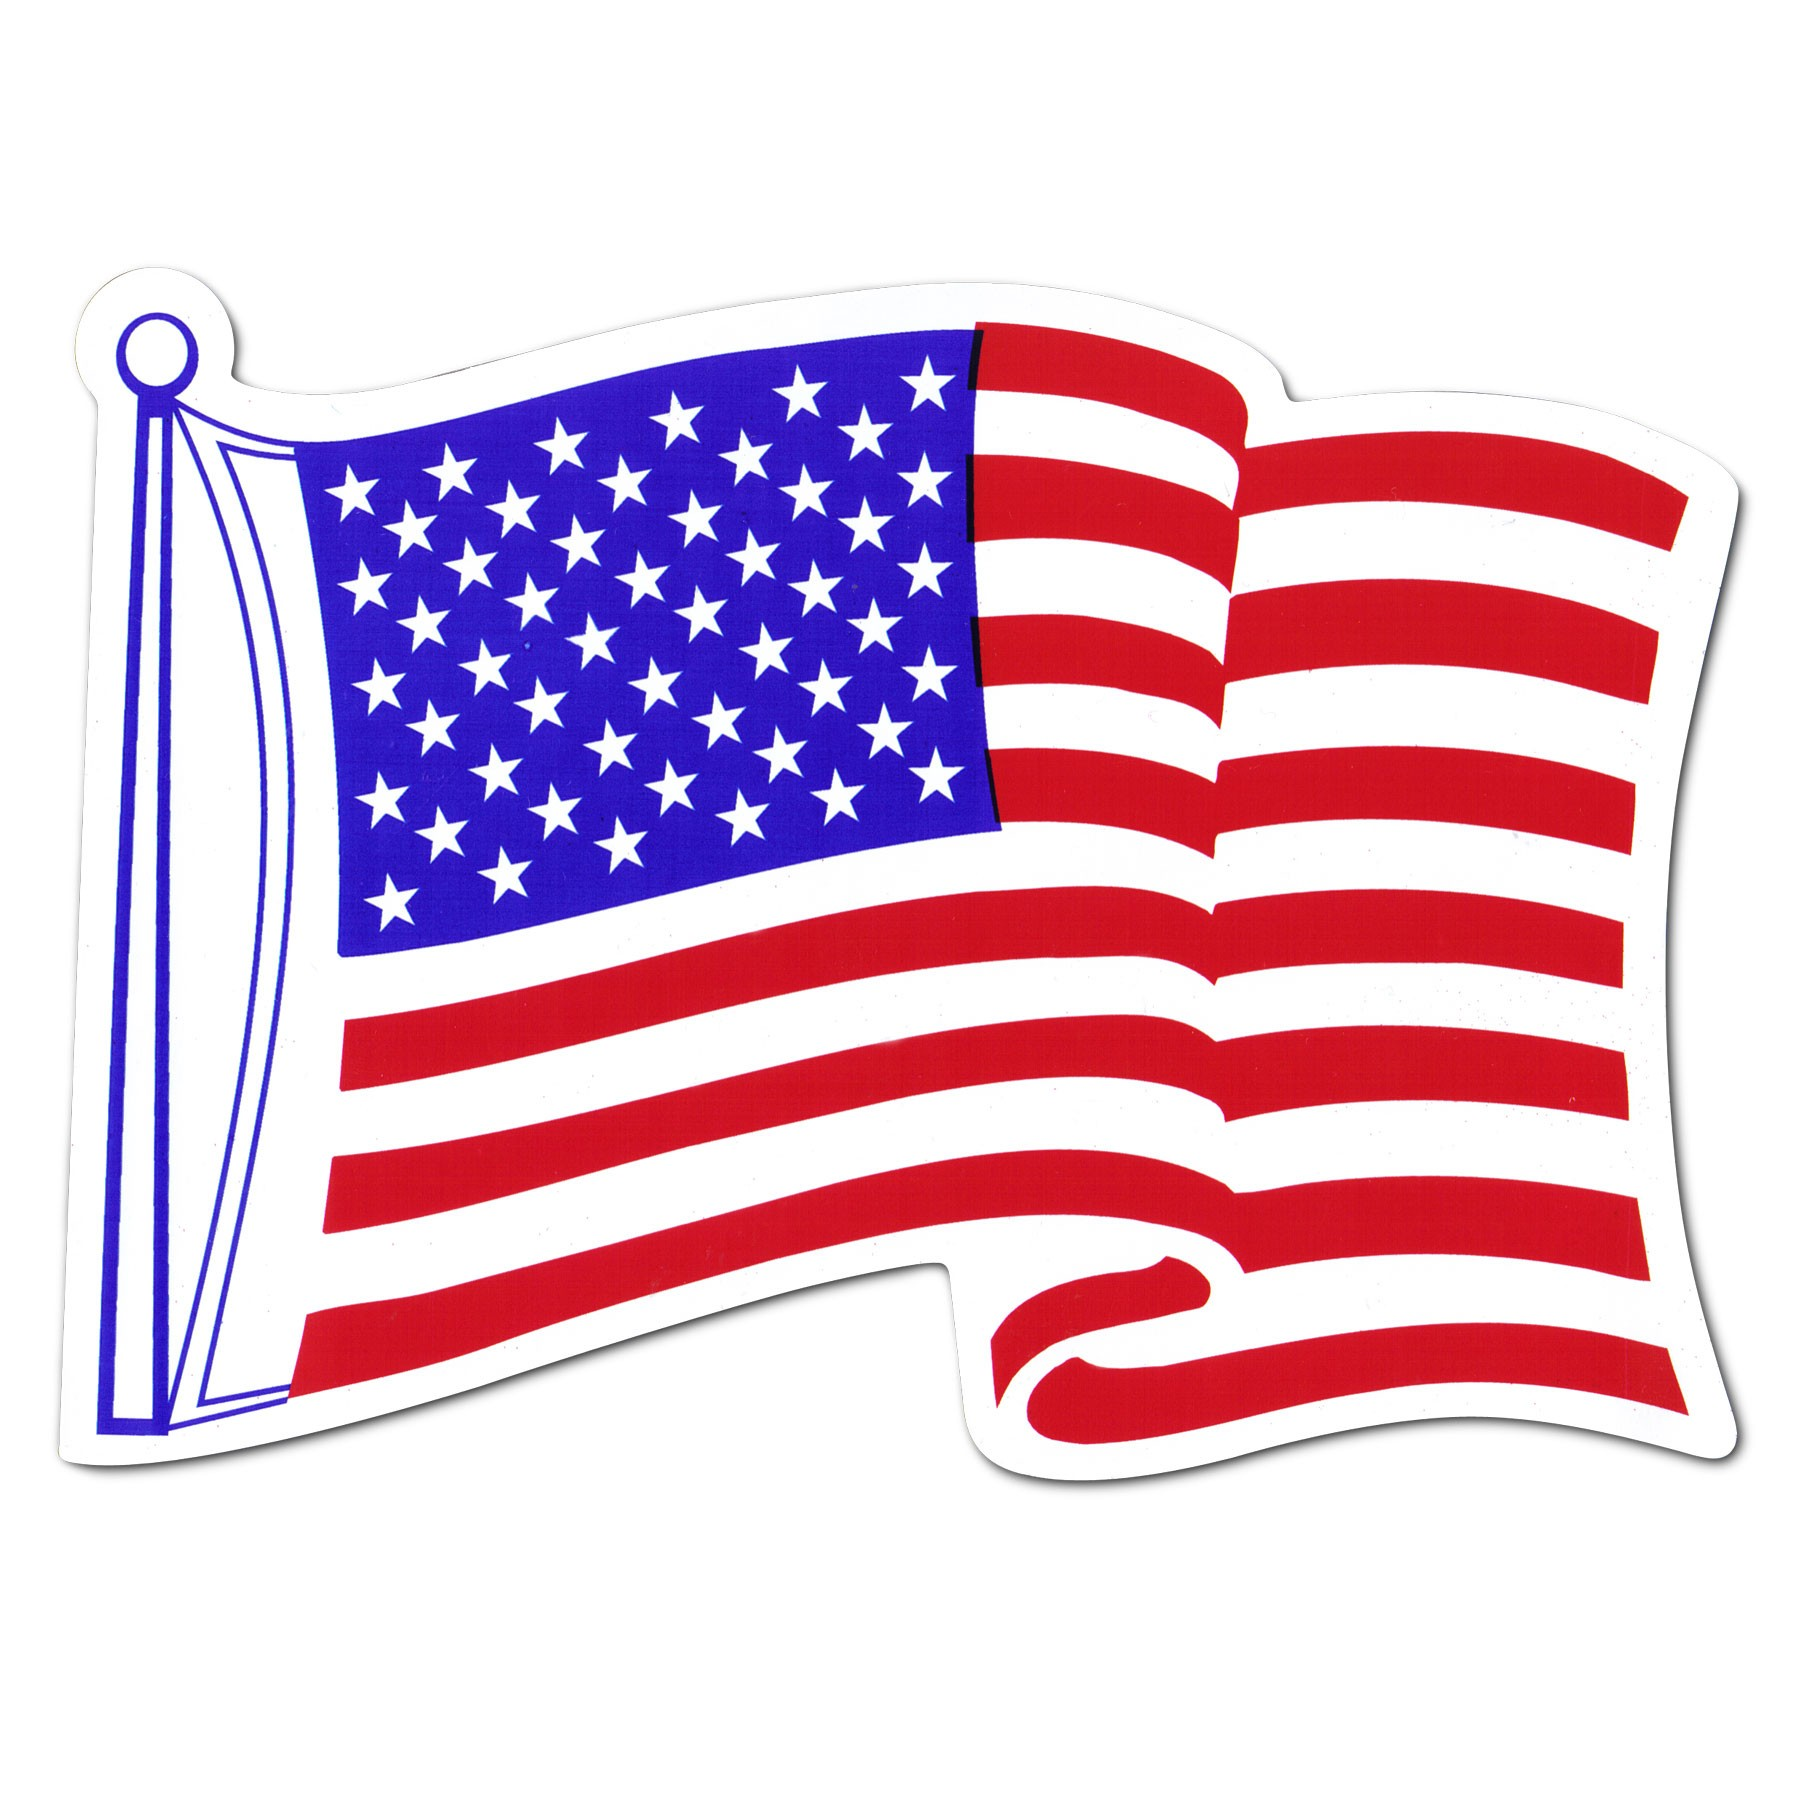 1800x1800 Clip Art Usa Flag Free